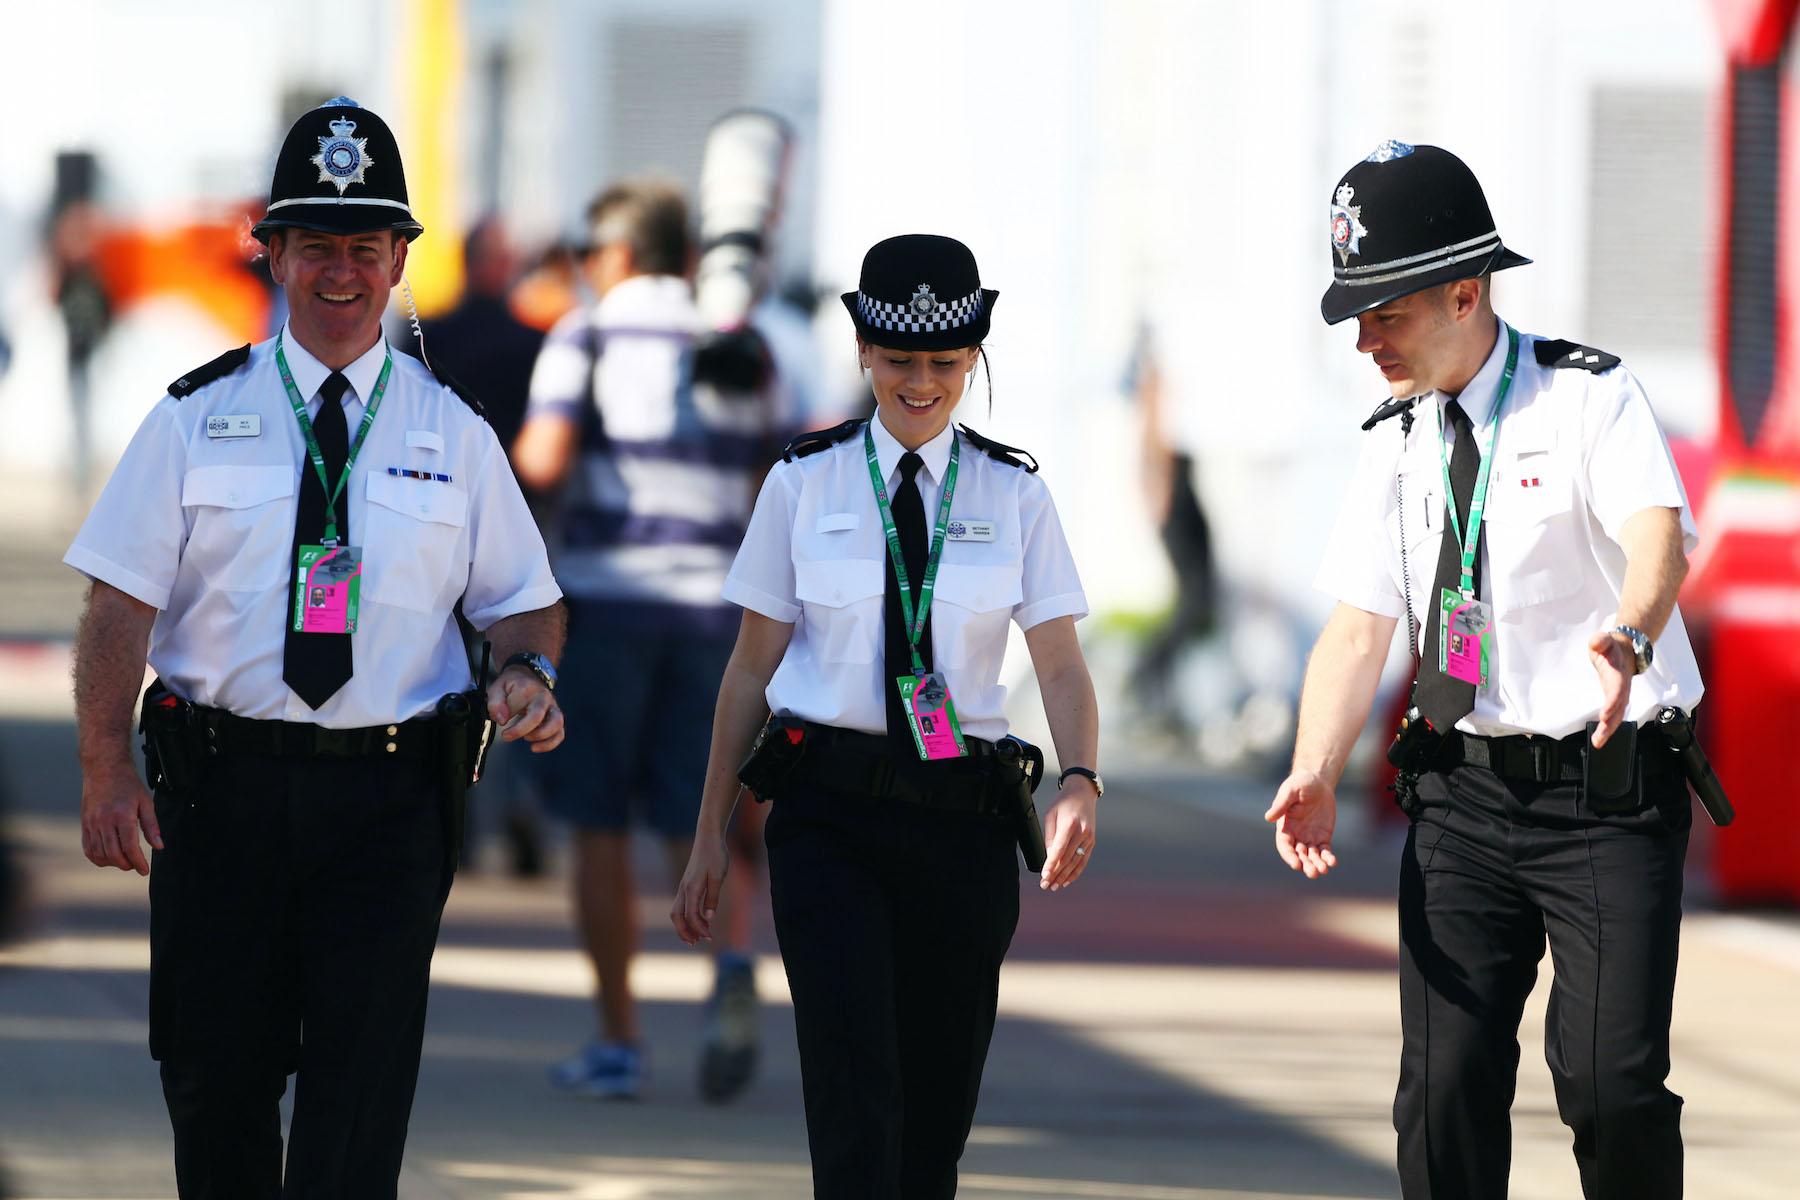 Silverstone police